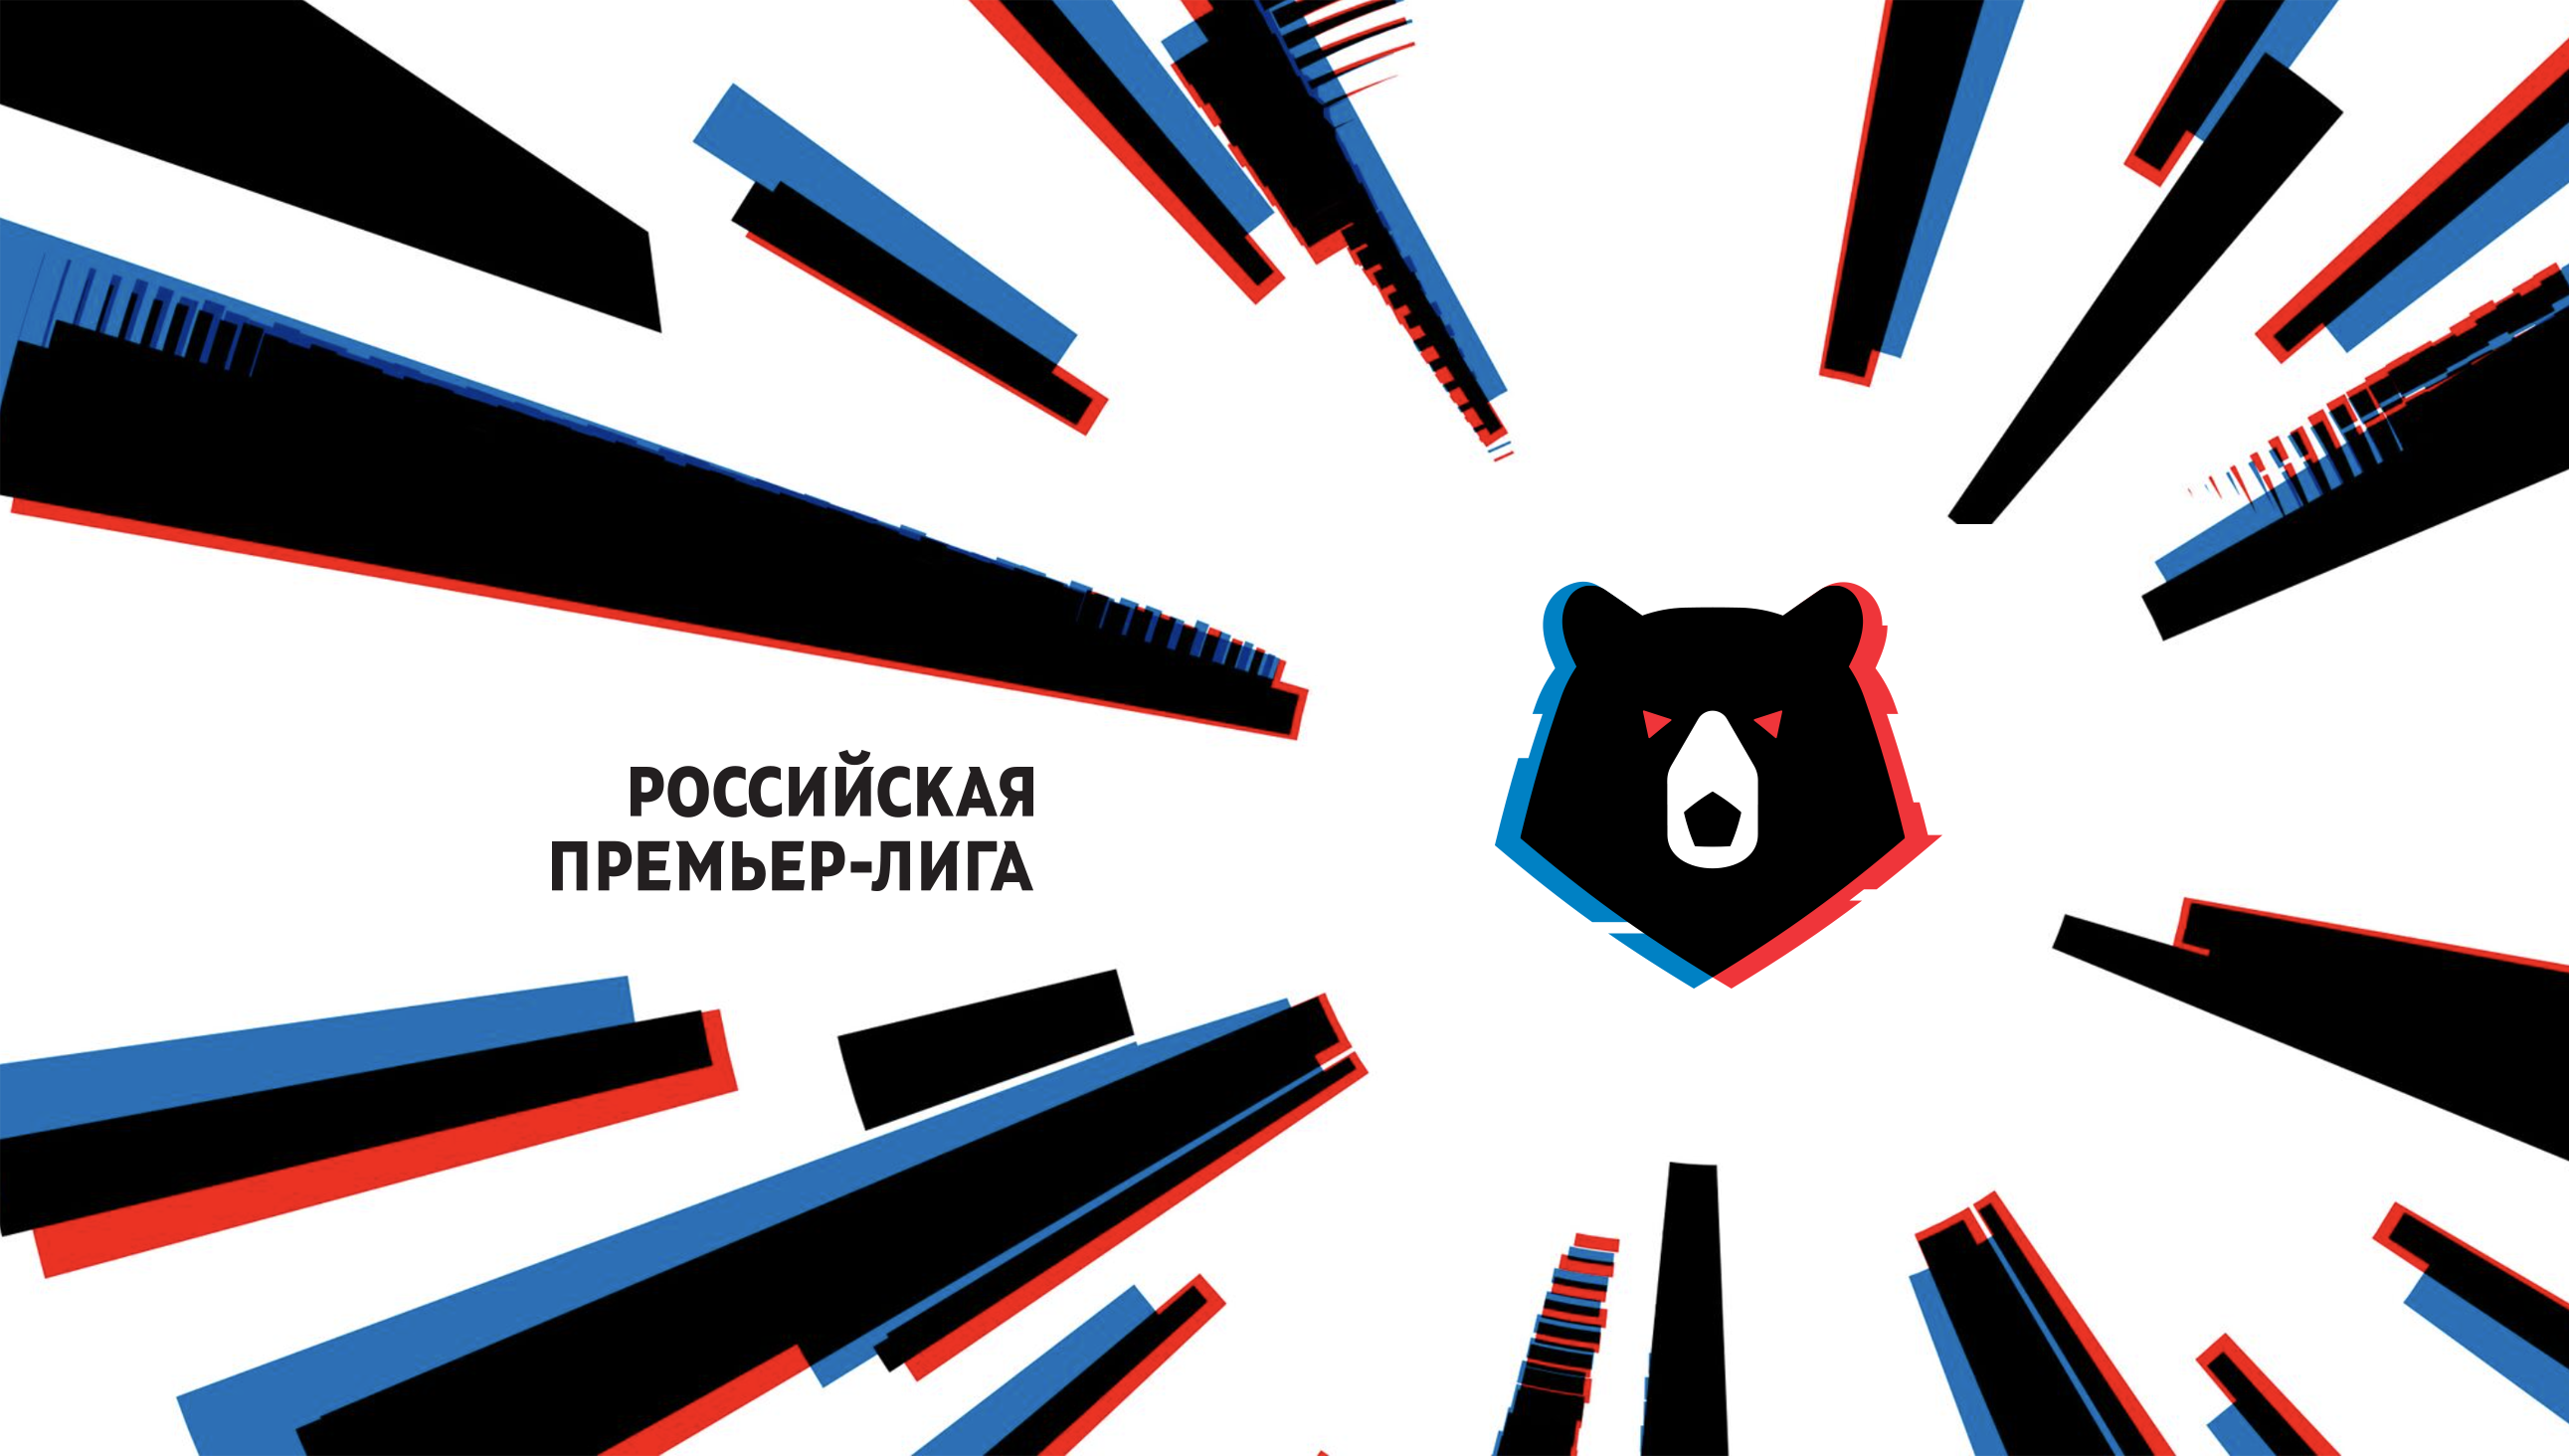 Новости хоккея КХЛ НХЛ чемпионат евротур онлайн